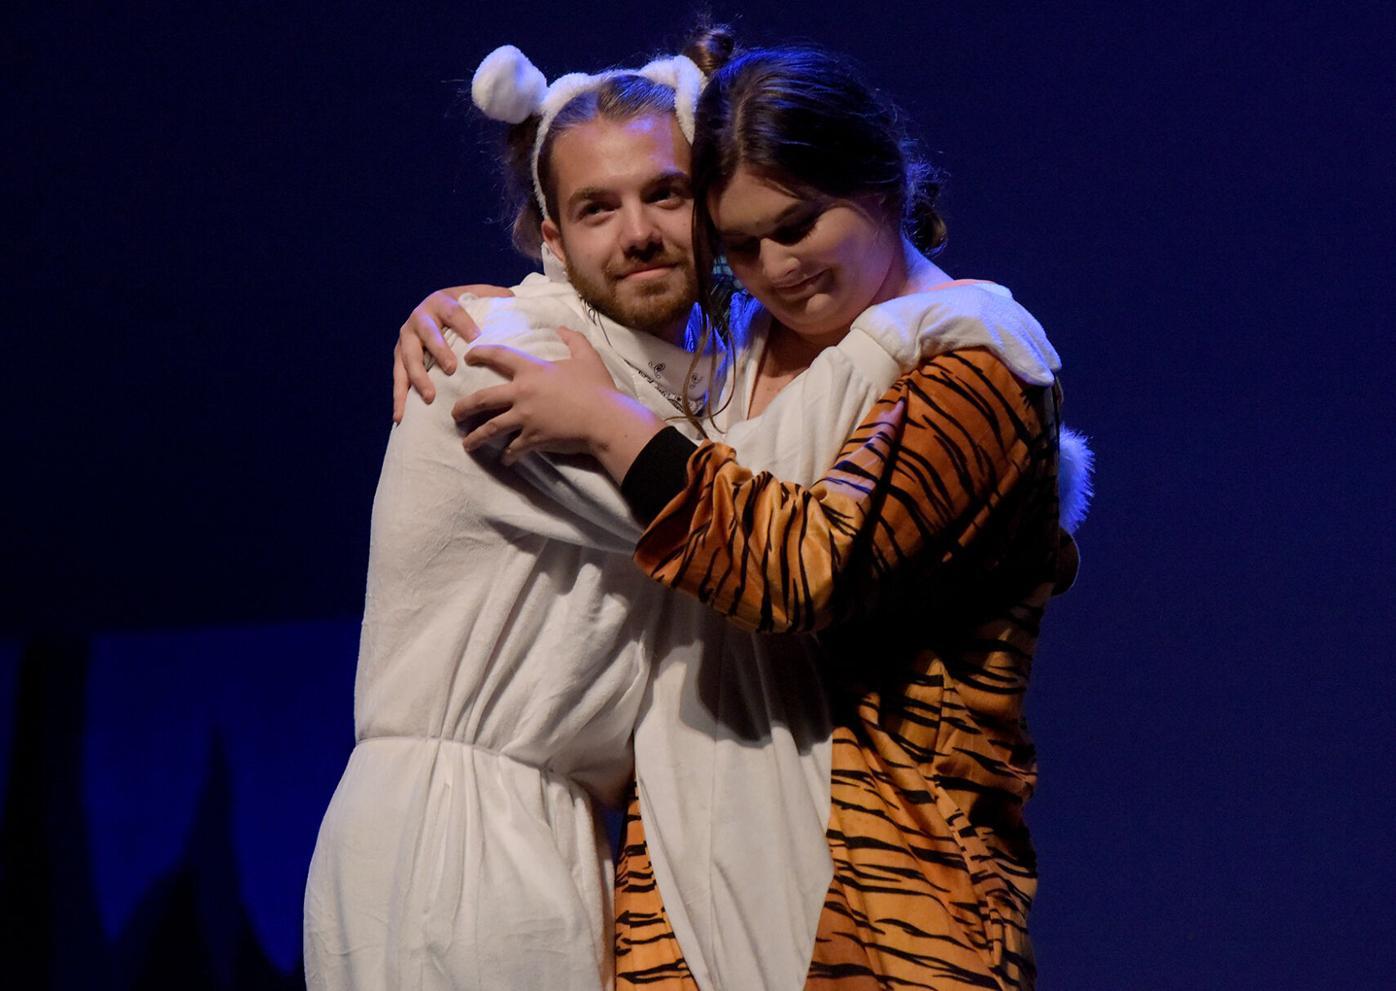 Joe Roberts, left, embraces Kathryn Merck as she performs as Truman (copy)